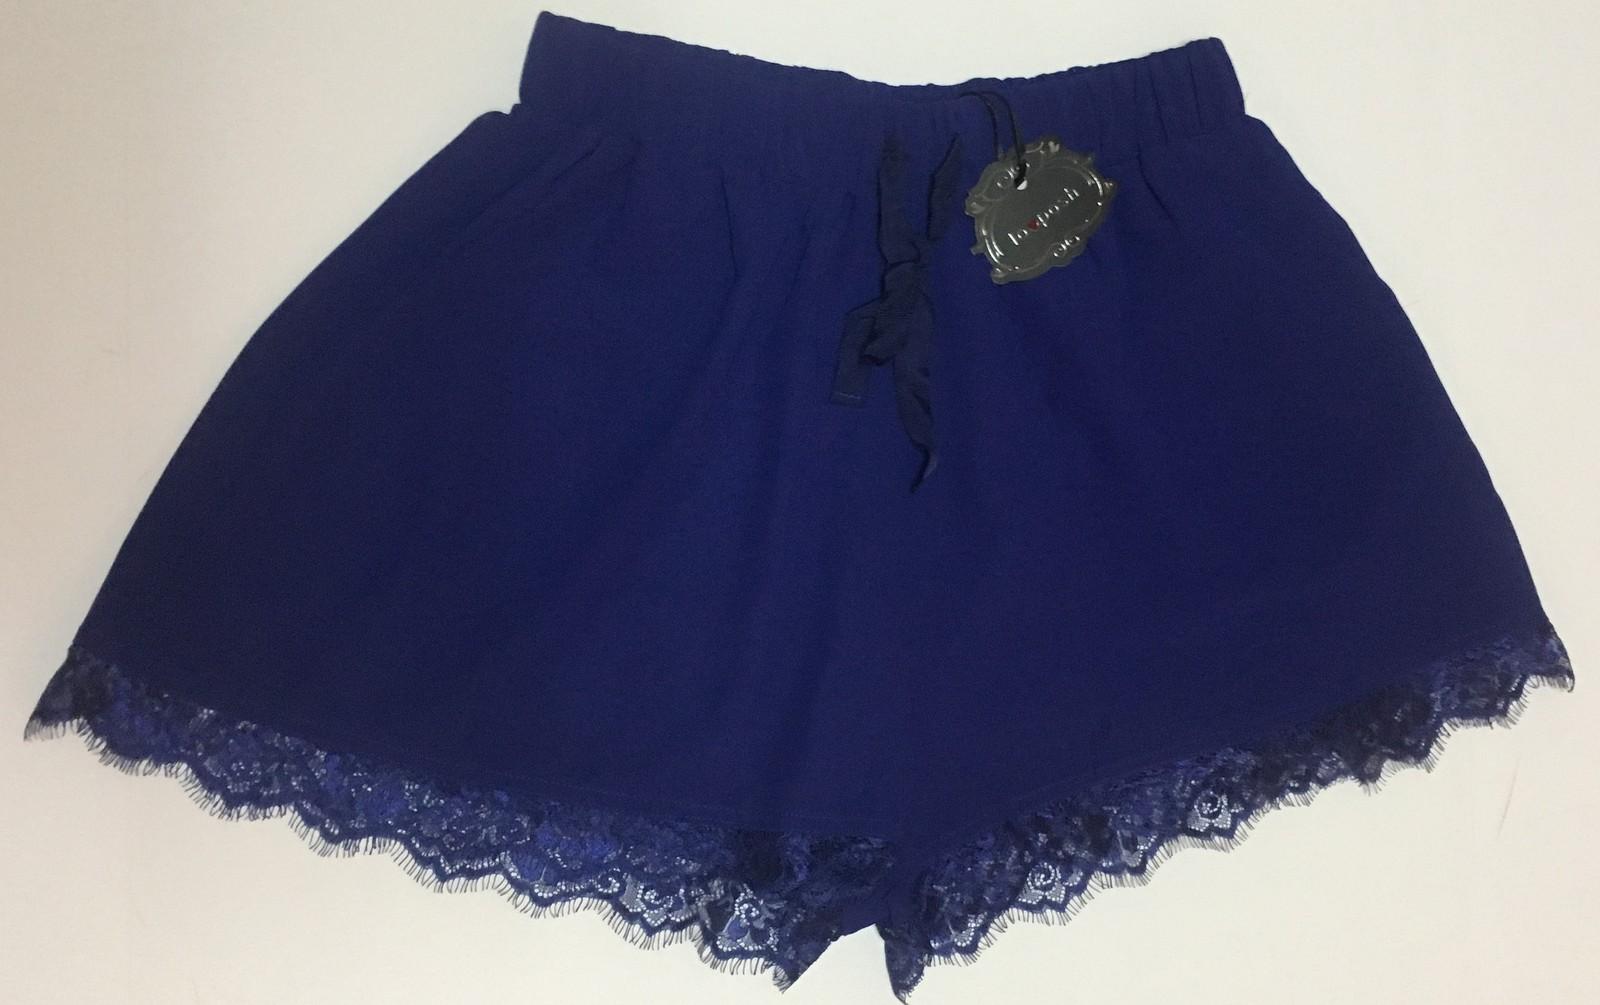 Lovposh Loungewear Casual Shorts Lace Royal Blue NWT Multiple Sizes